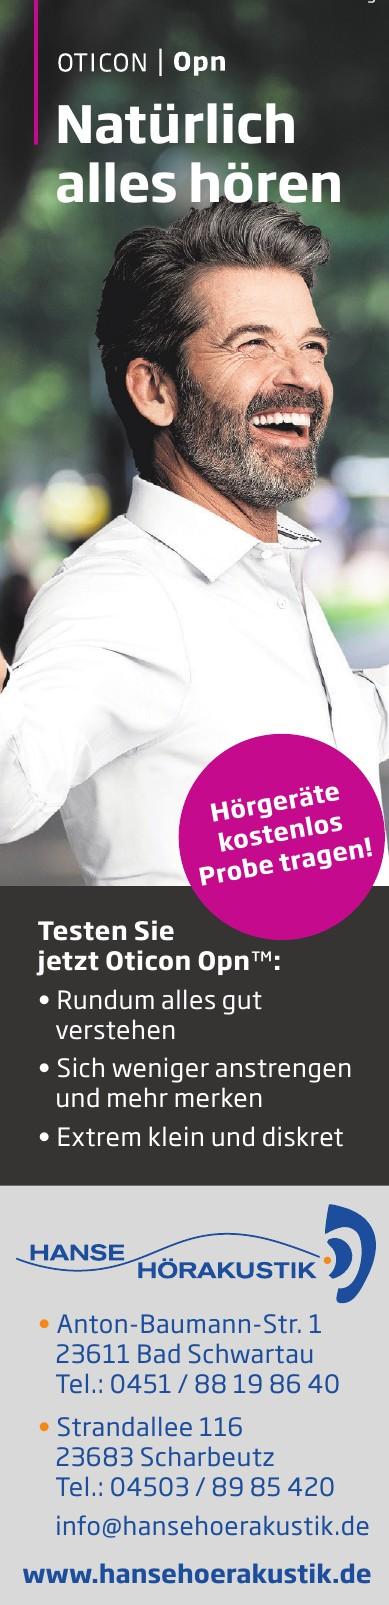 Hanse Hörgeräteakustik GmbH